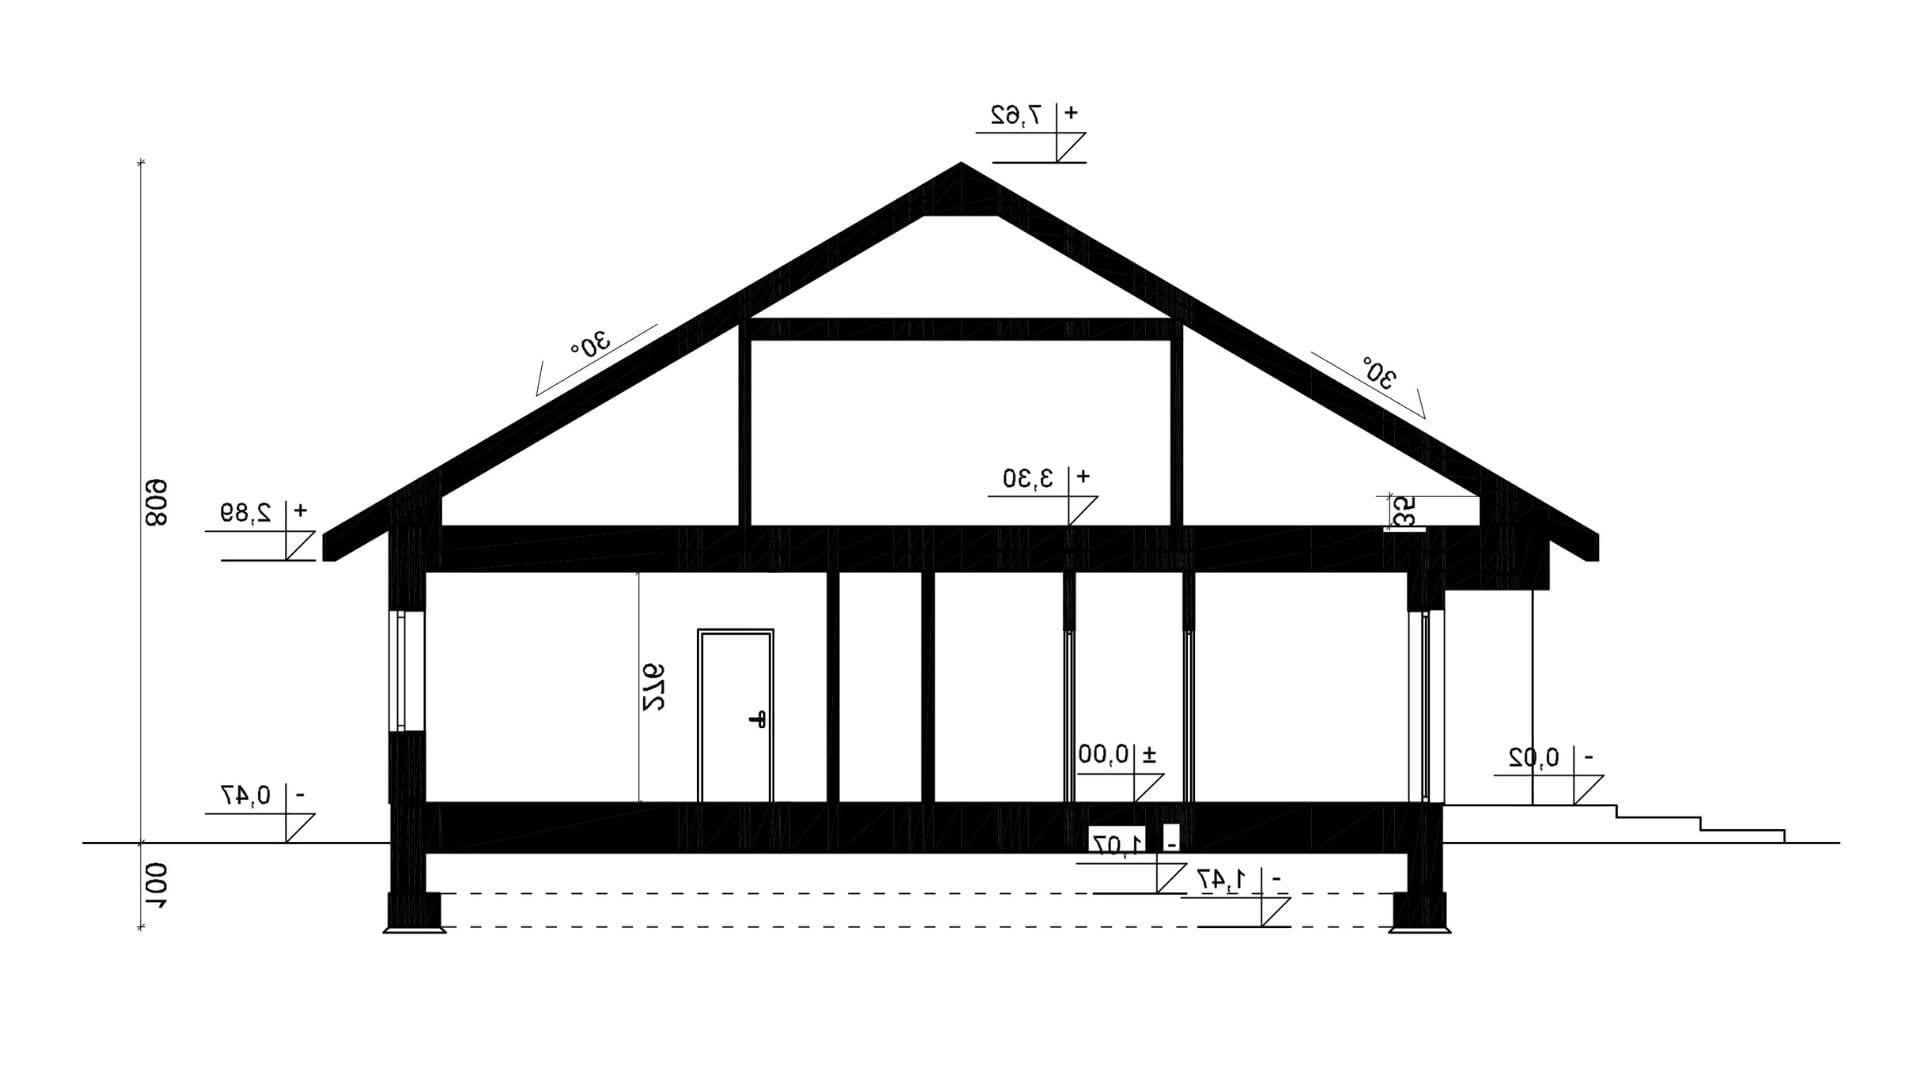 Przekrój A-A - projekt domu SEJ-PRO 071/1 ENERGO - odbicie lustrzane